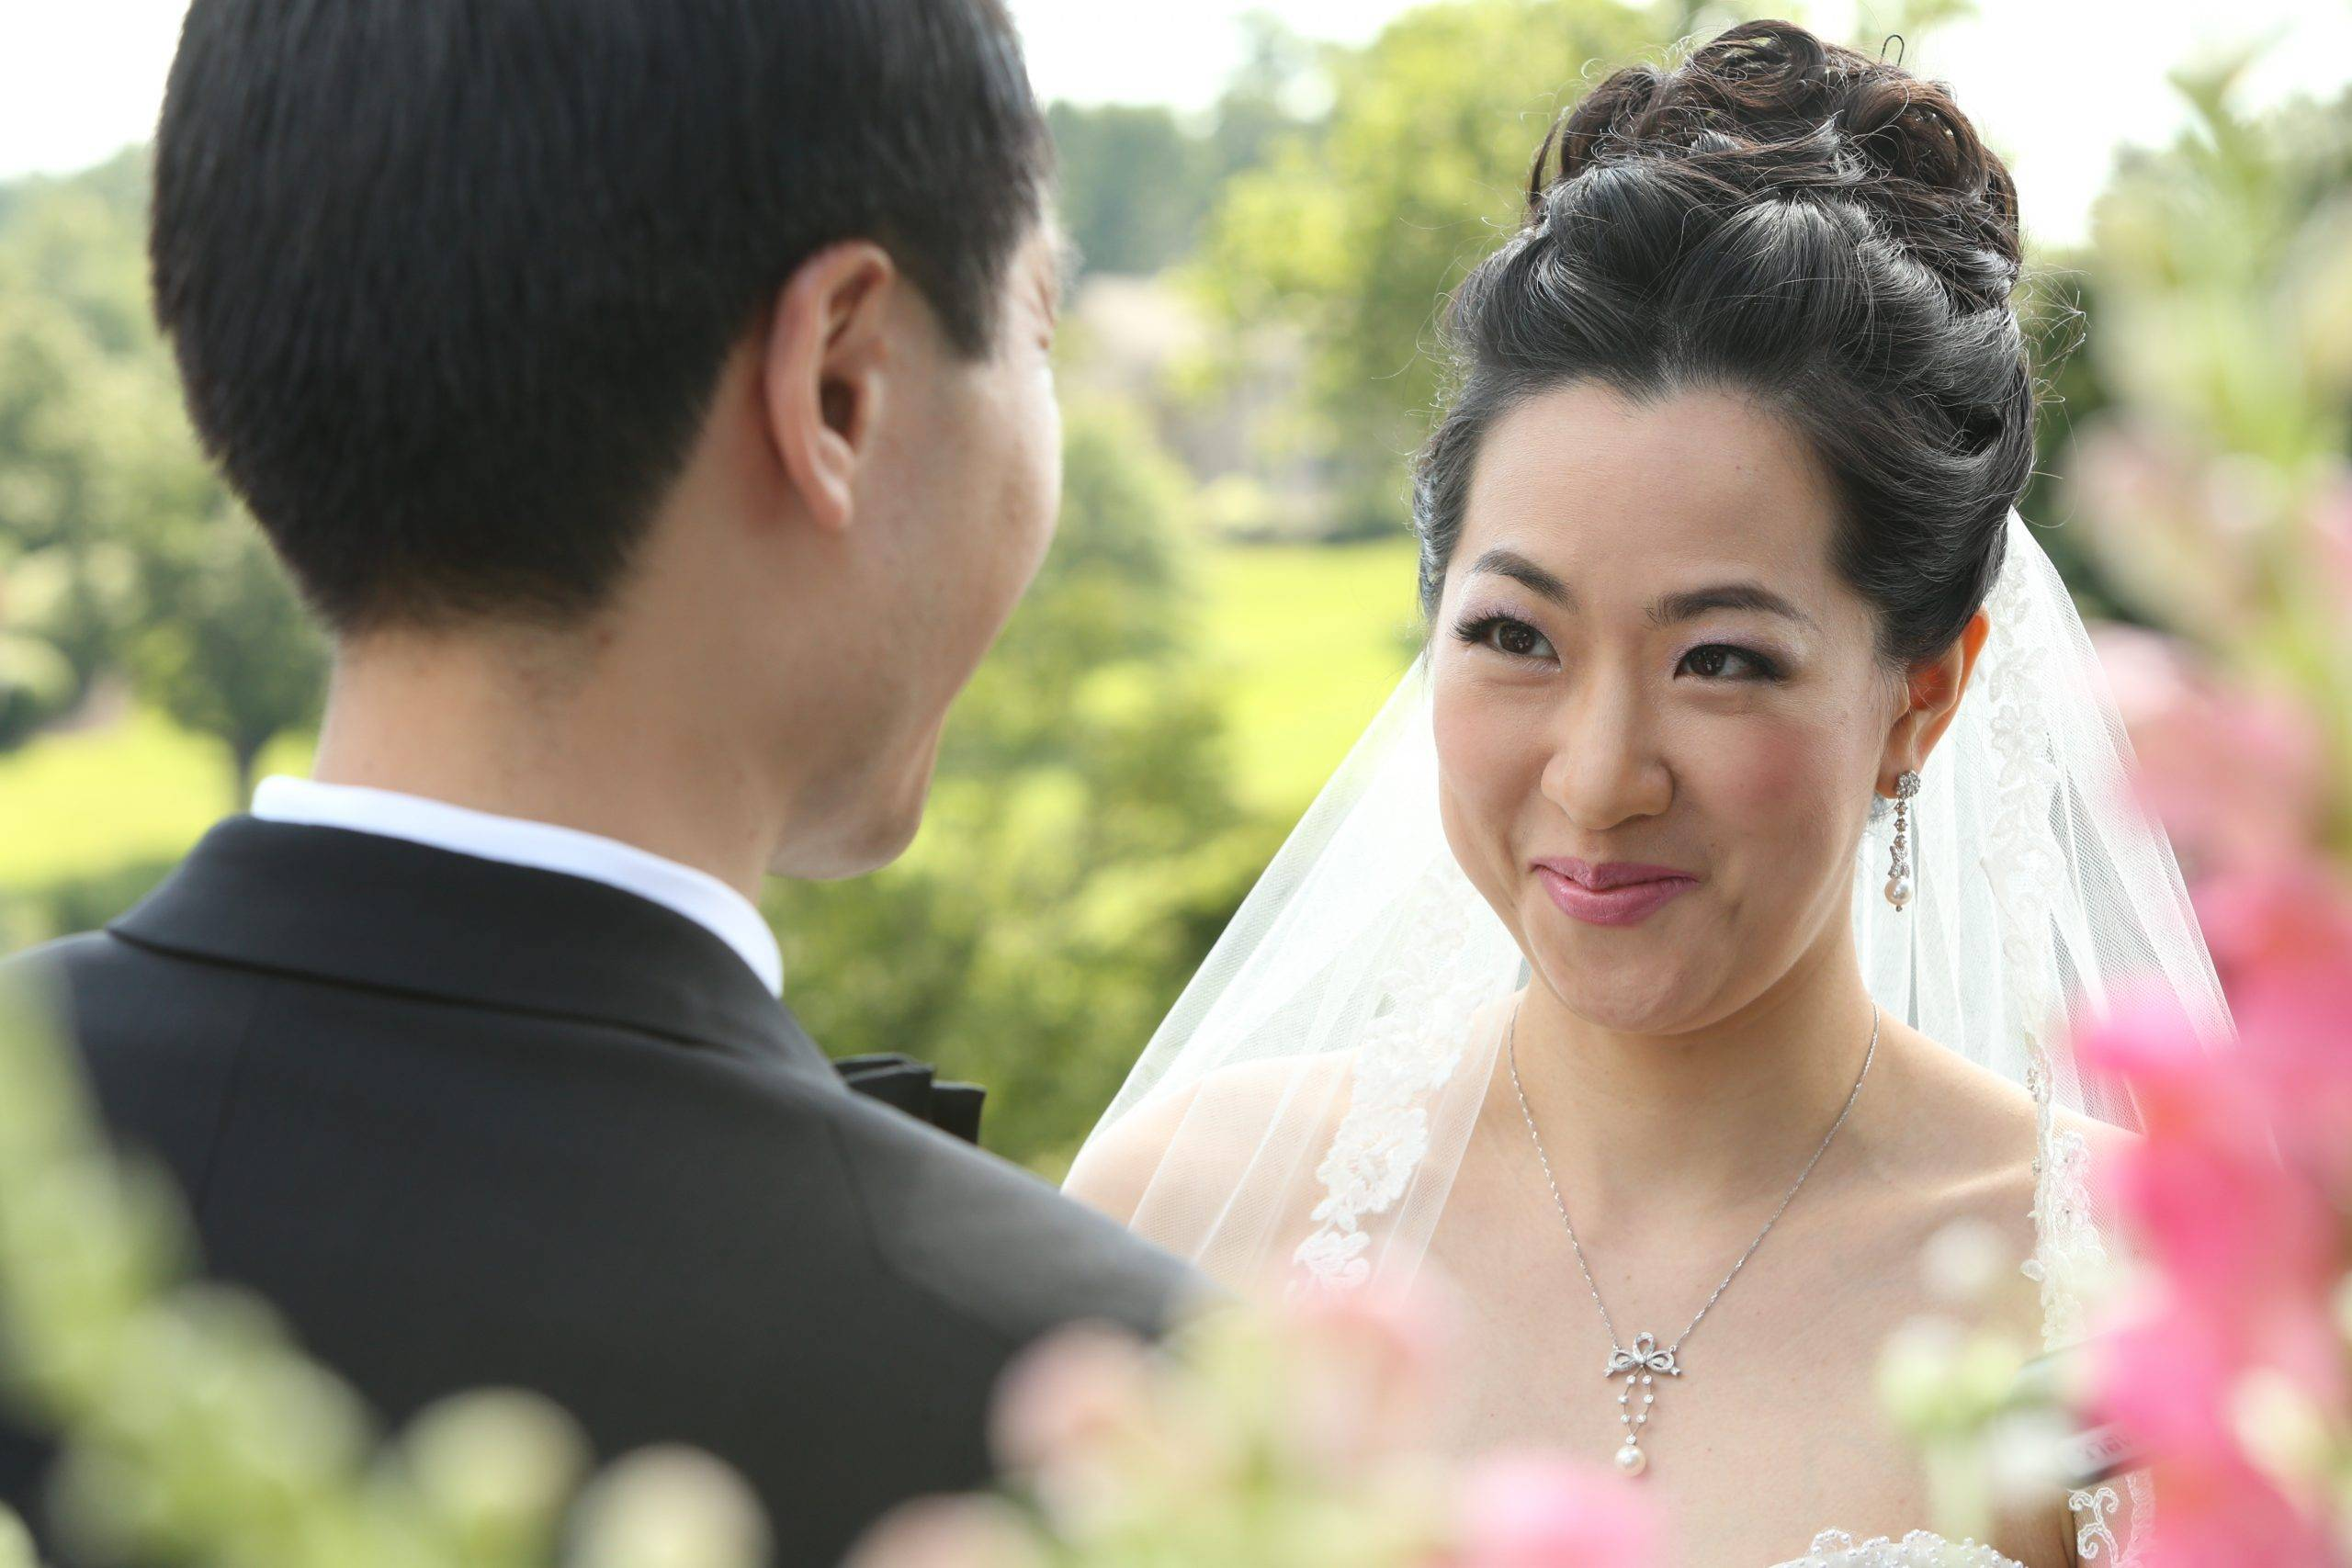 Brooklake bride smiling at the groom